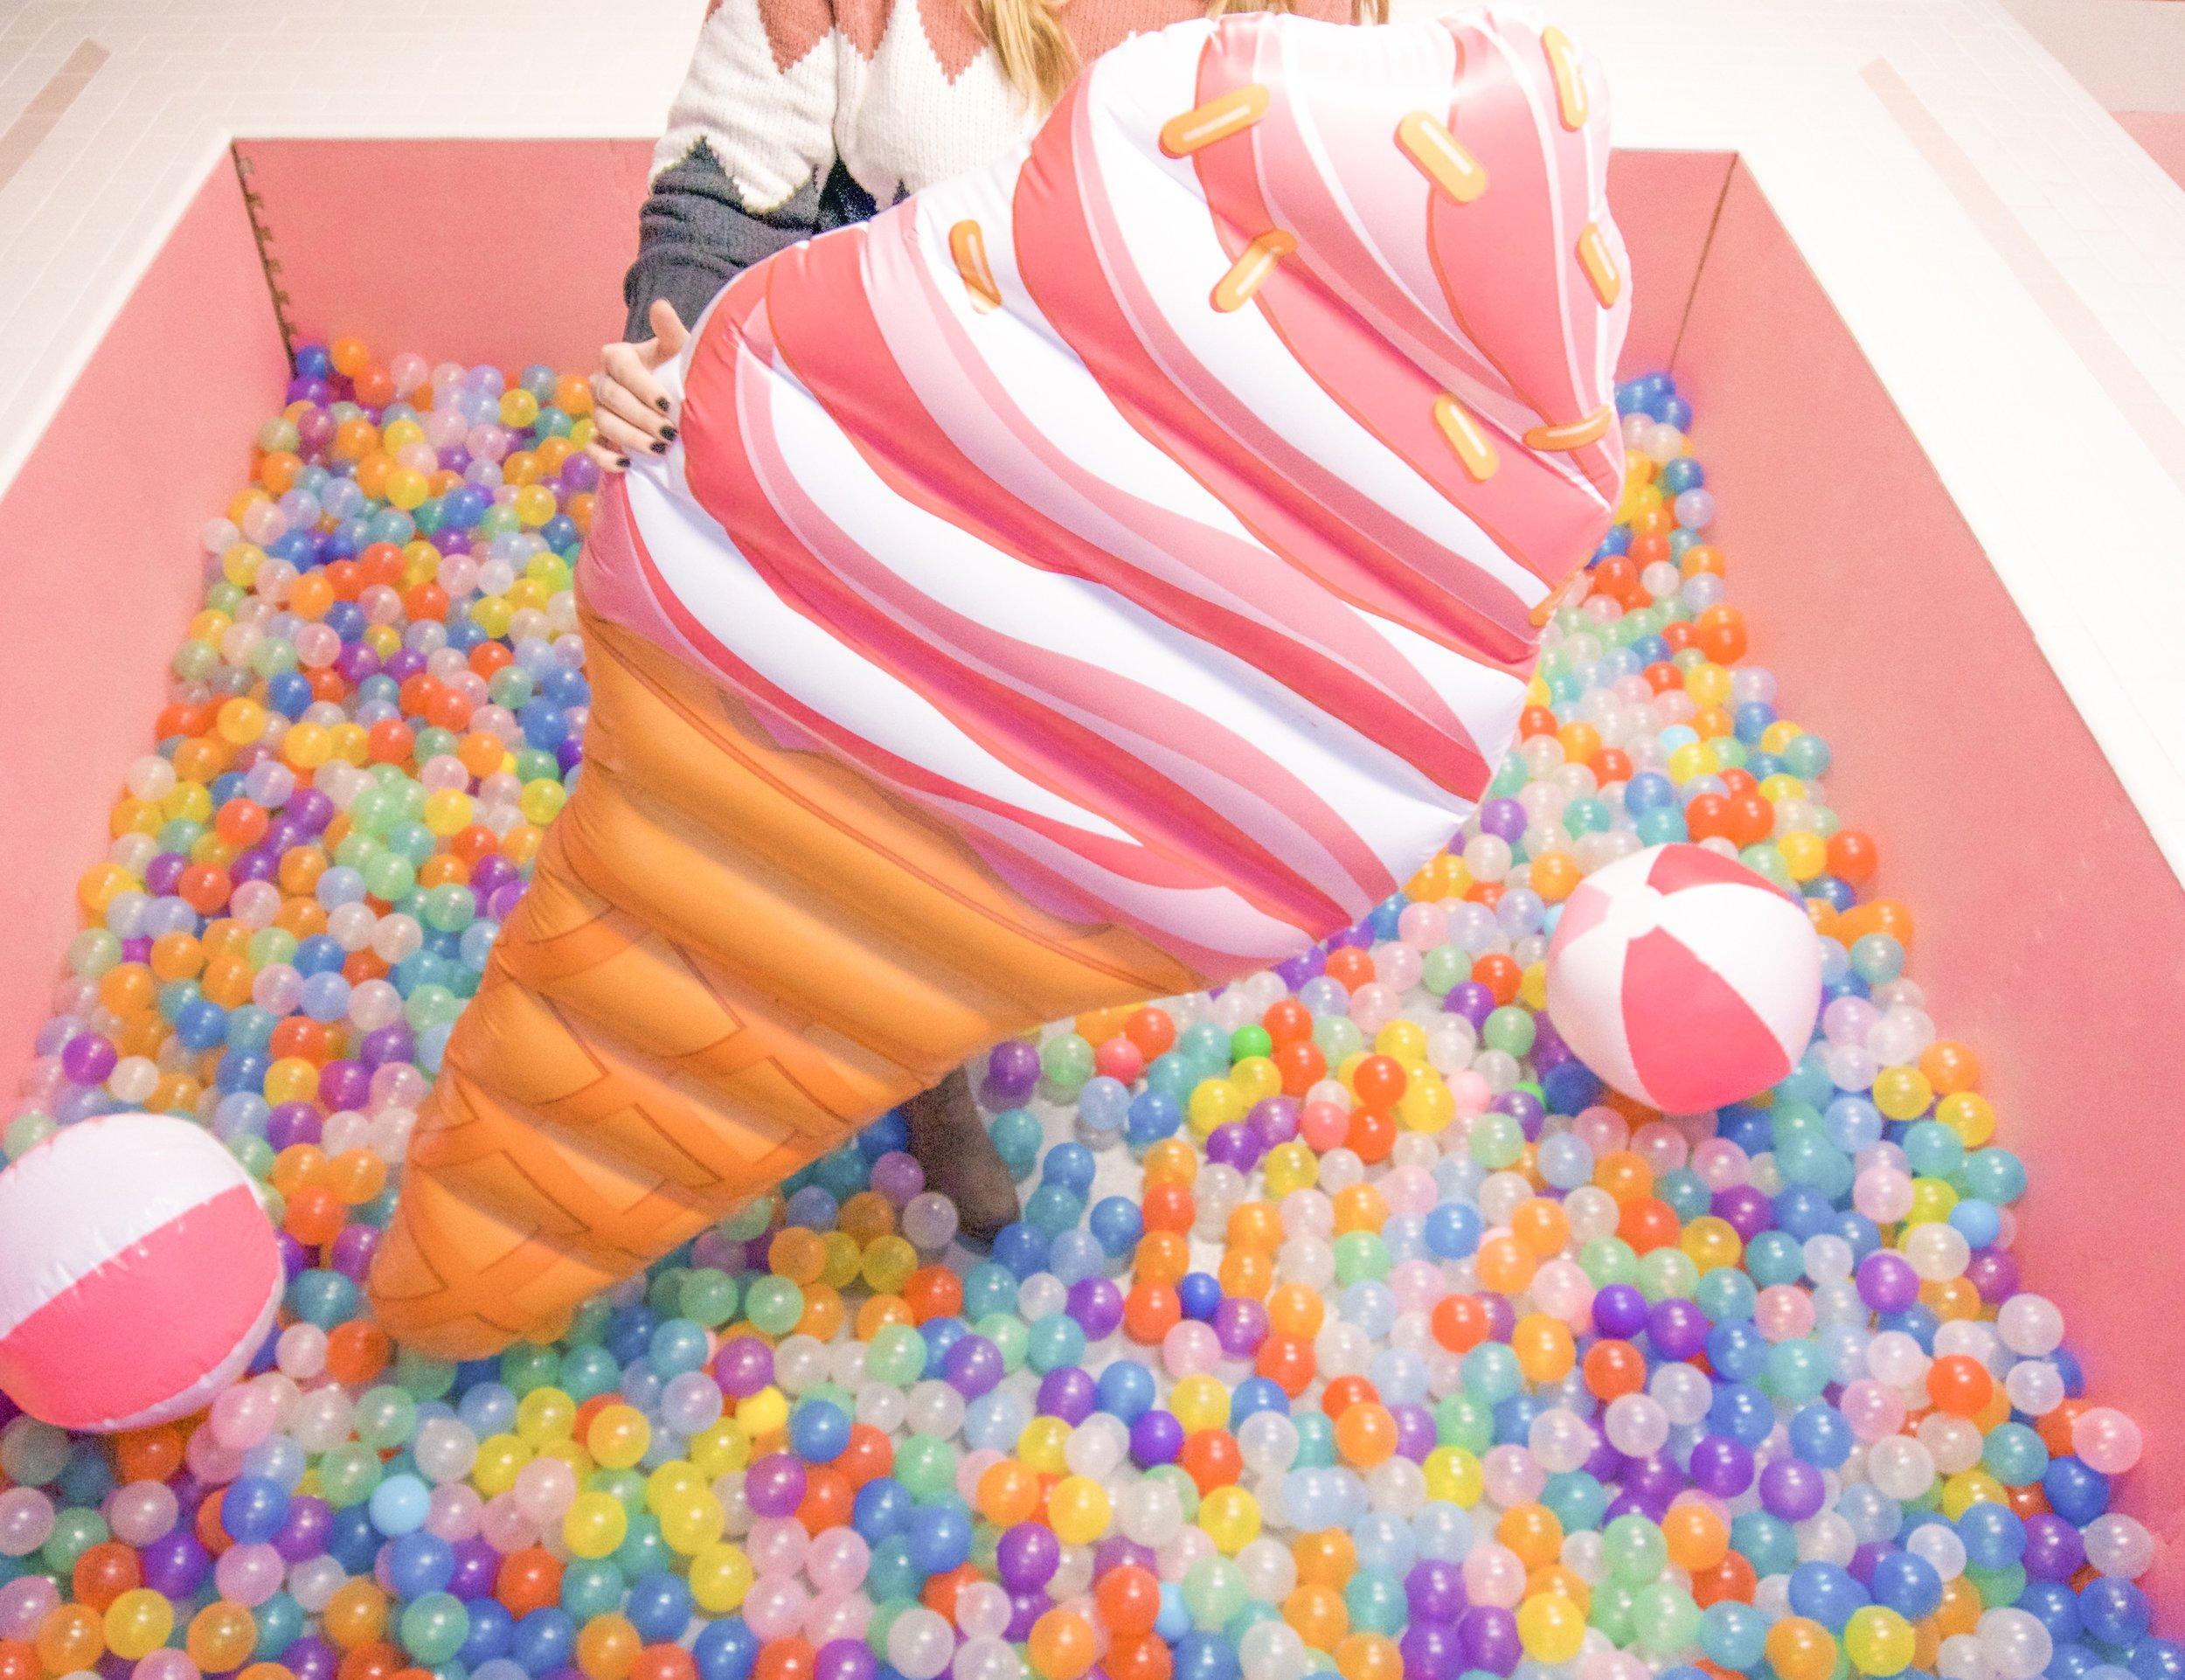 art-of-ice-cream-experience-9